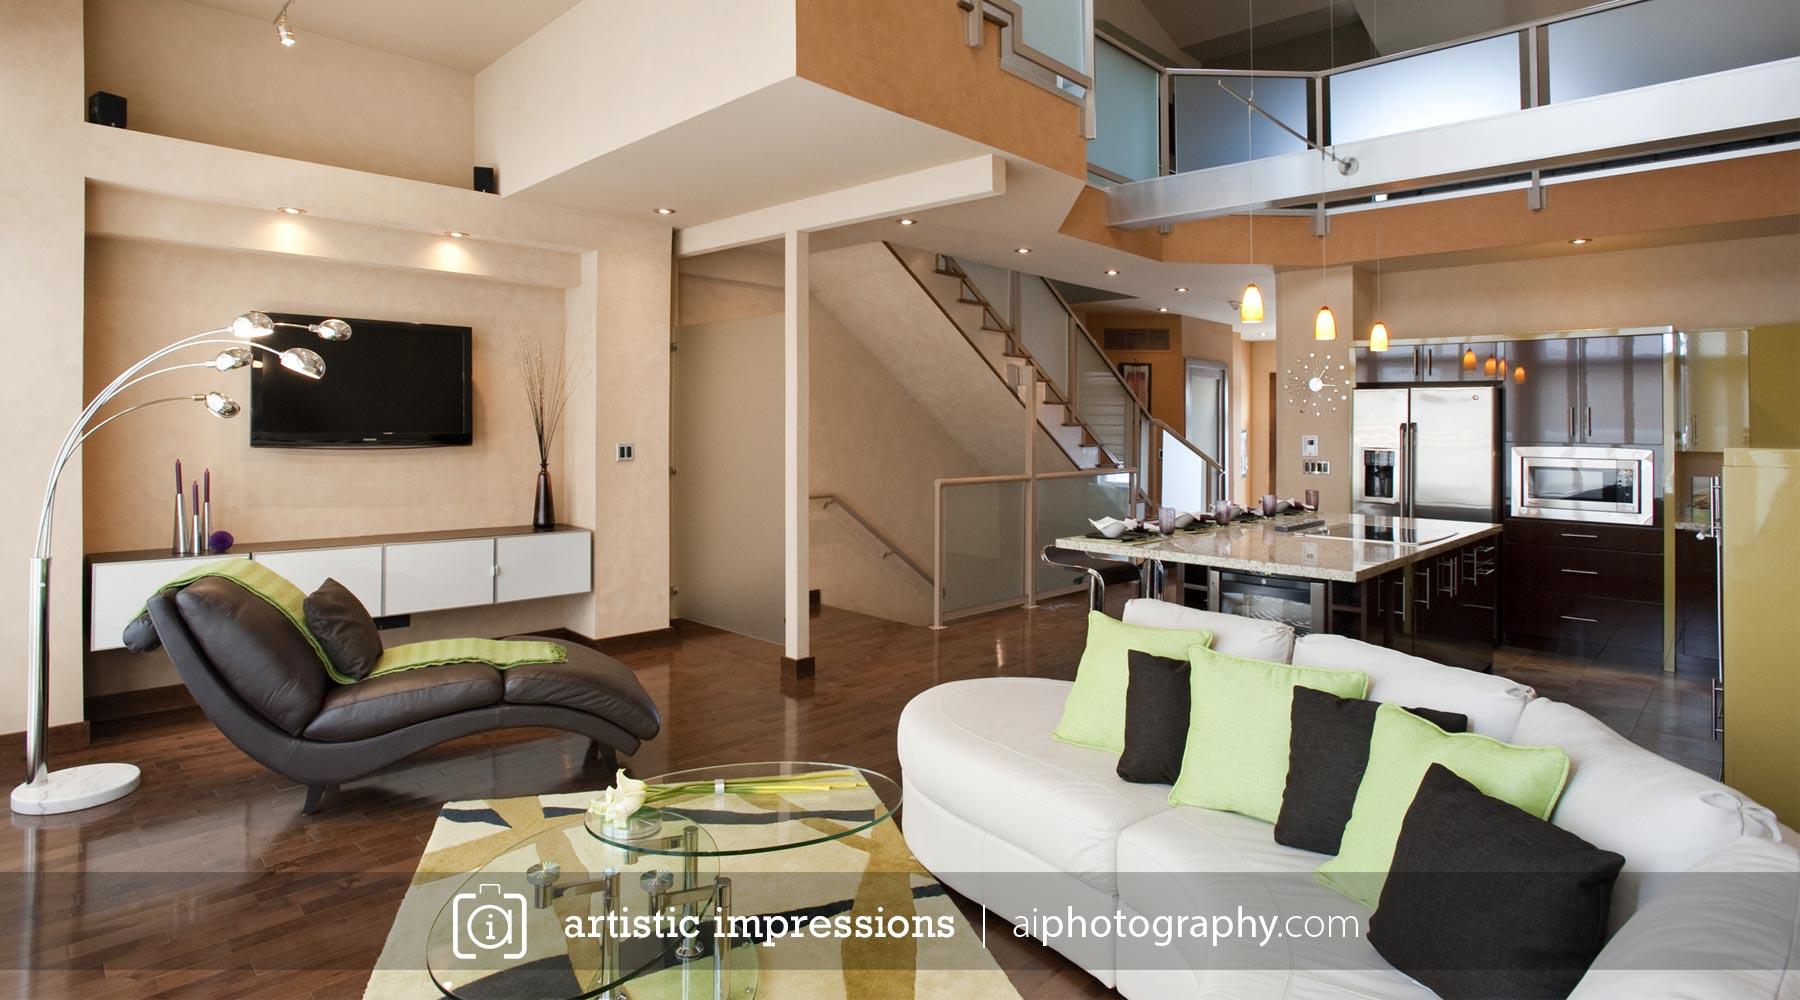 Bon Photographer Winnipeg Interior Advertising Residential Home  Builders Interior Designers Photography Architecture 1080 Corydon 2